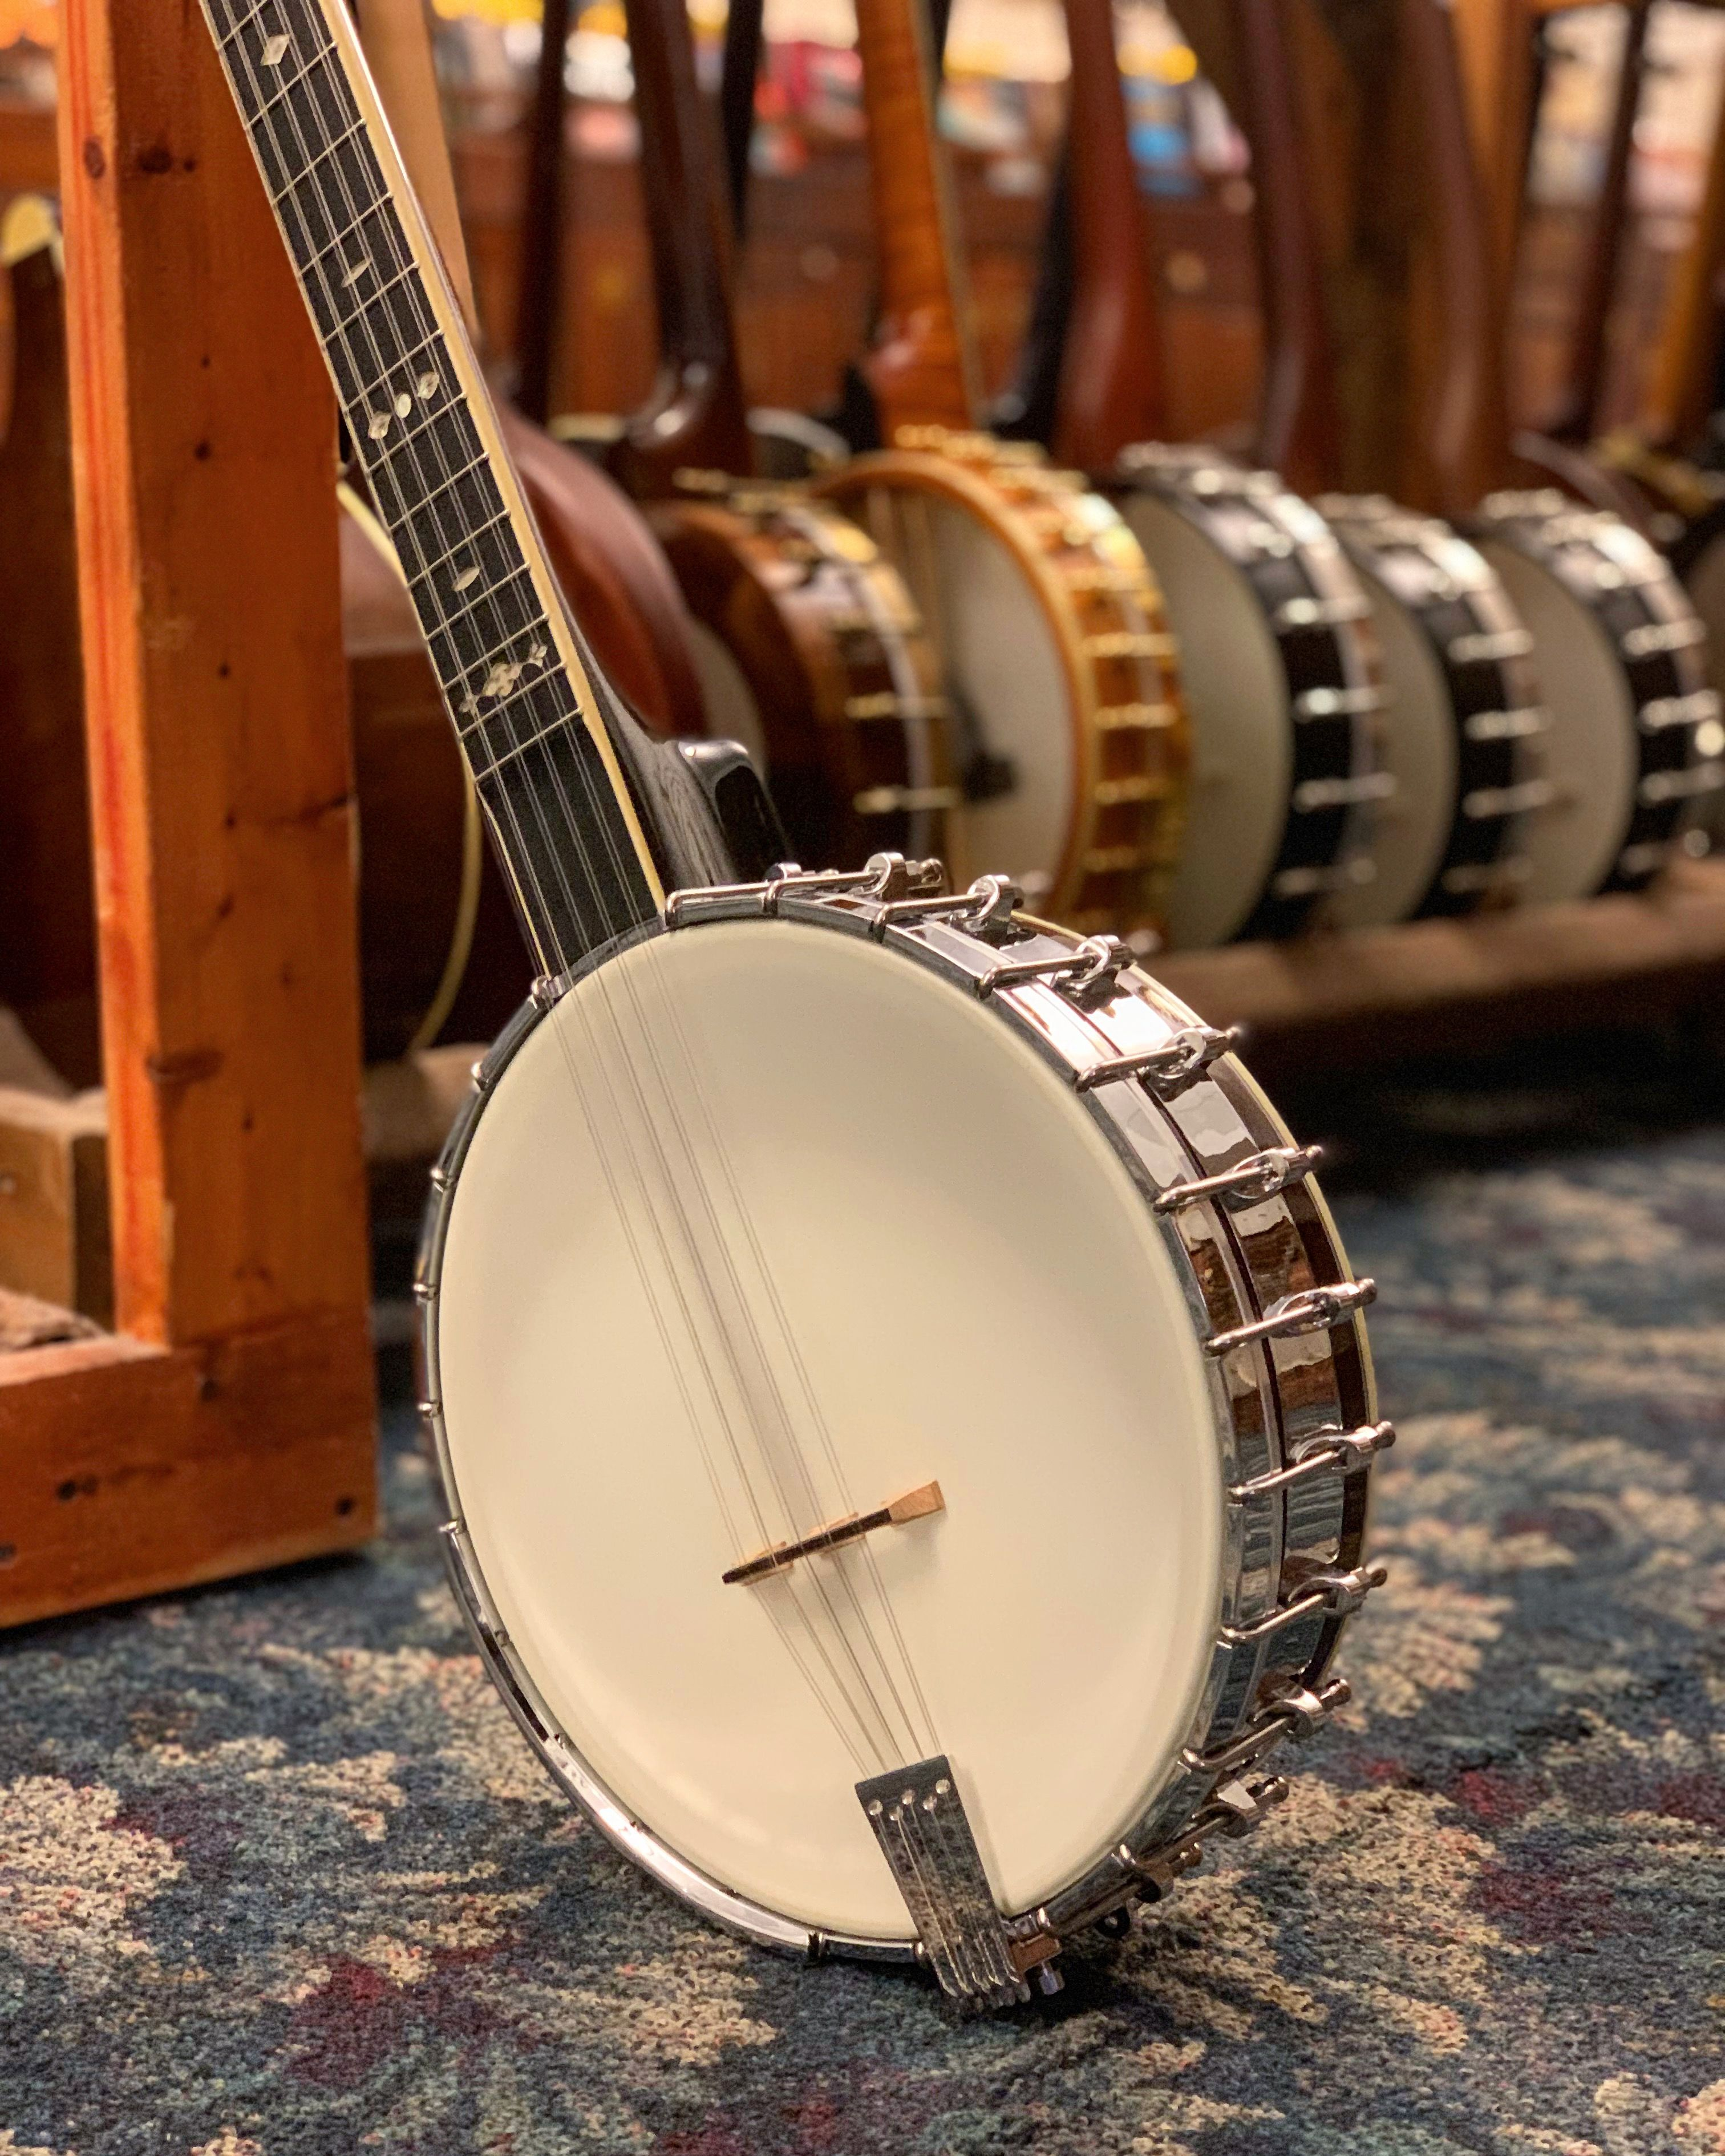 Ready to explore some new banjo tones? This Gold Tone OT-10